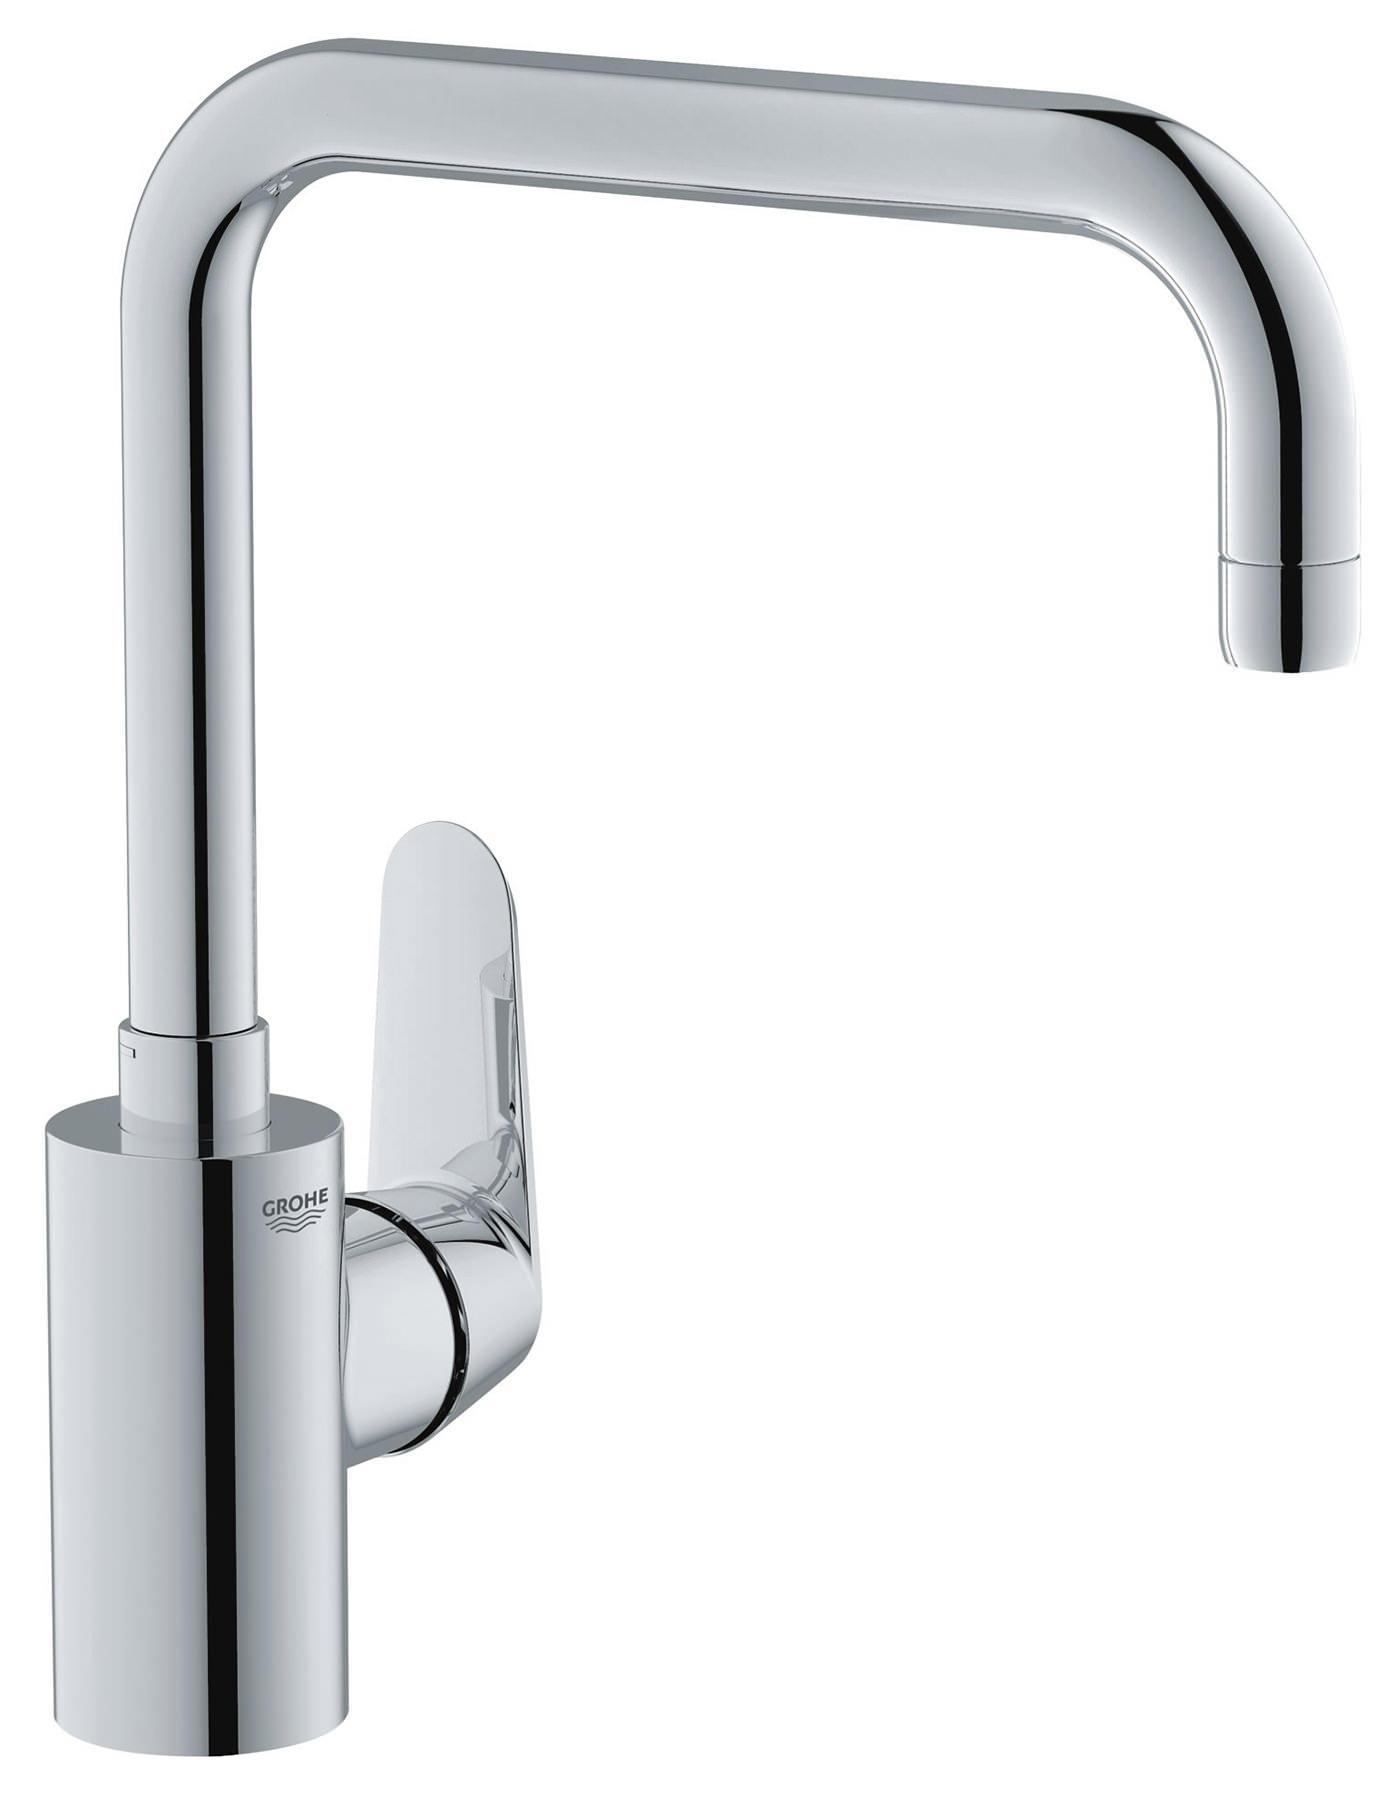 grohe eurodisc cosmopolitan monobloc high spout sink mixer tap. Black Bedroom Furniture Sets. Home Design Ideas